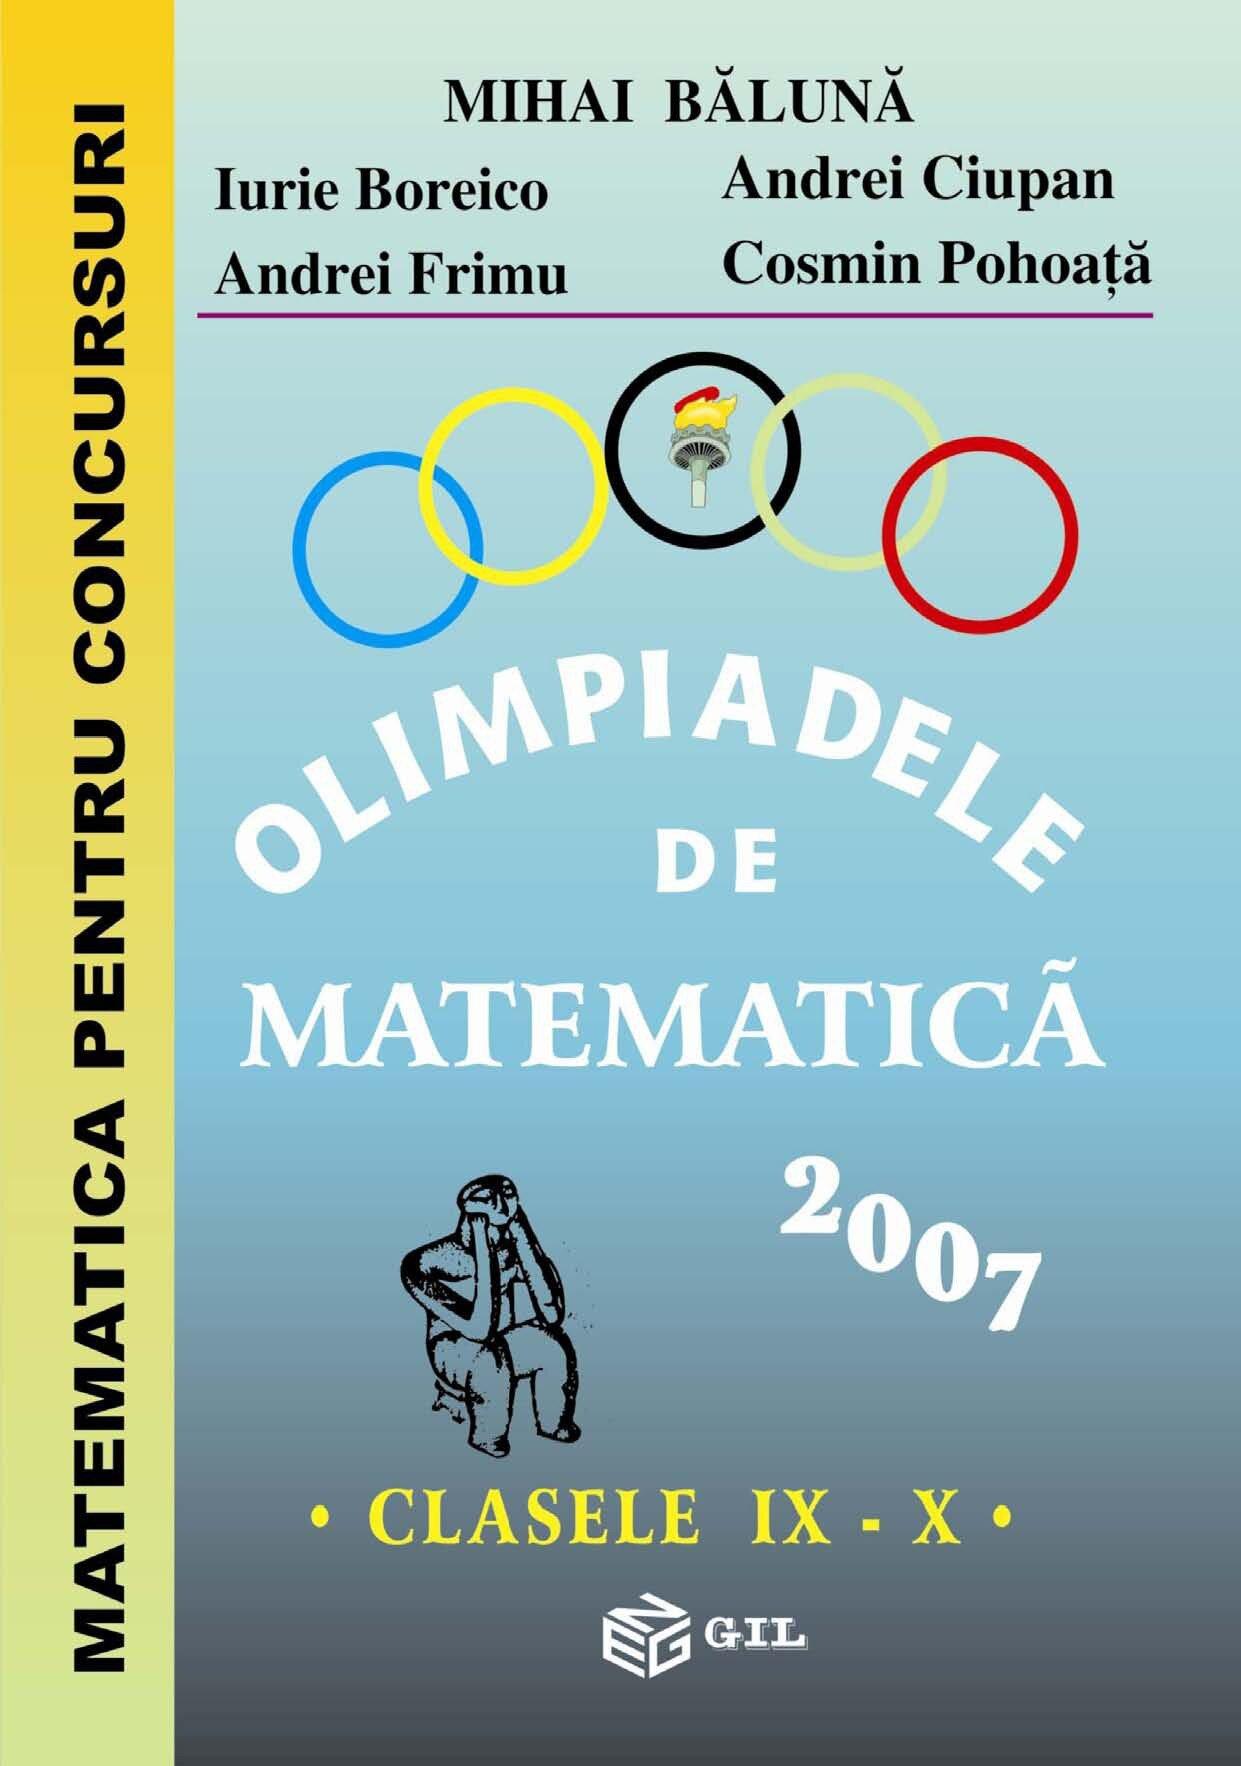 Olimpiade de Matematica IX-X 2007 (eBook)